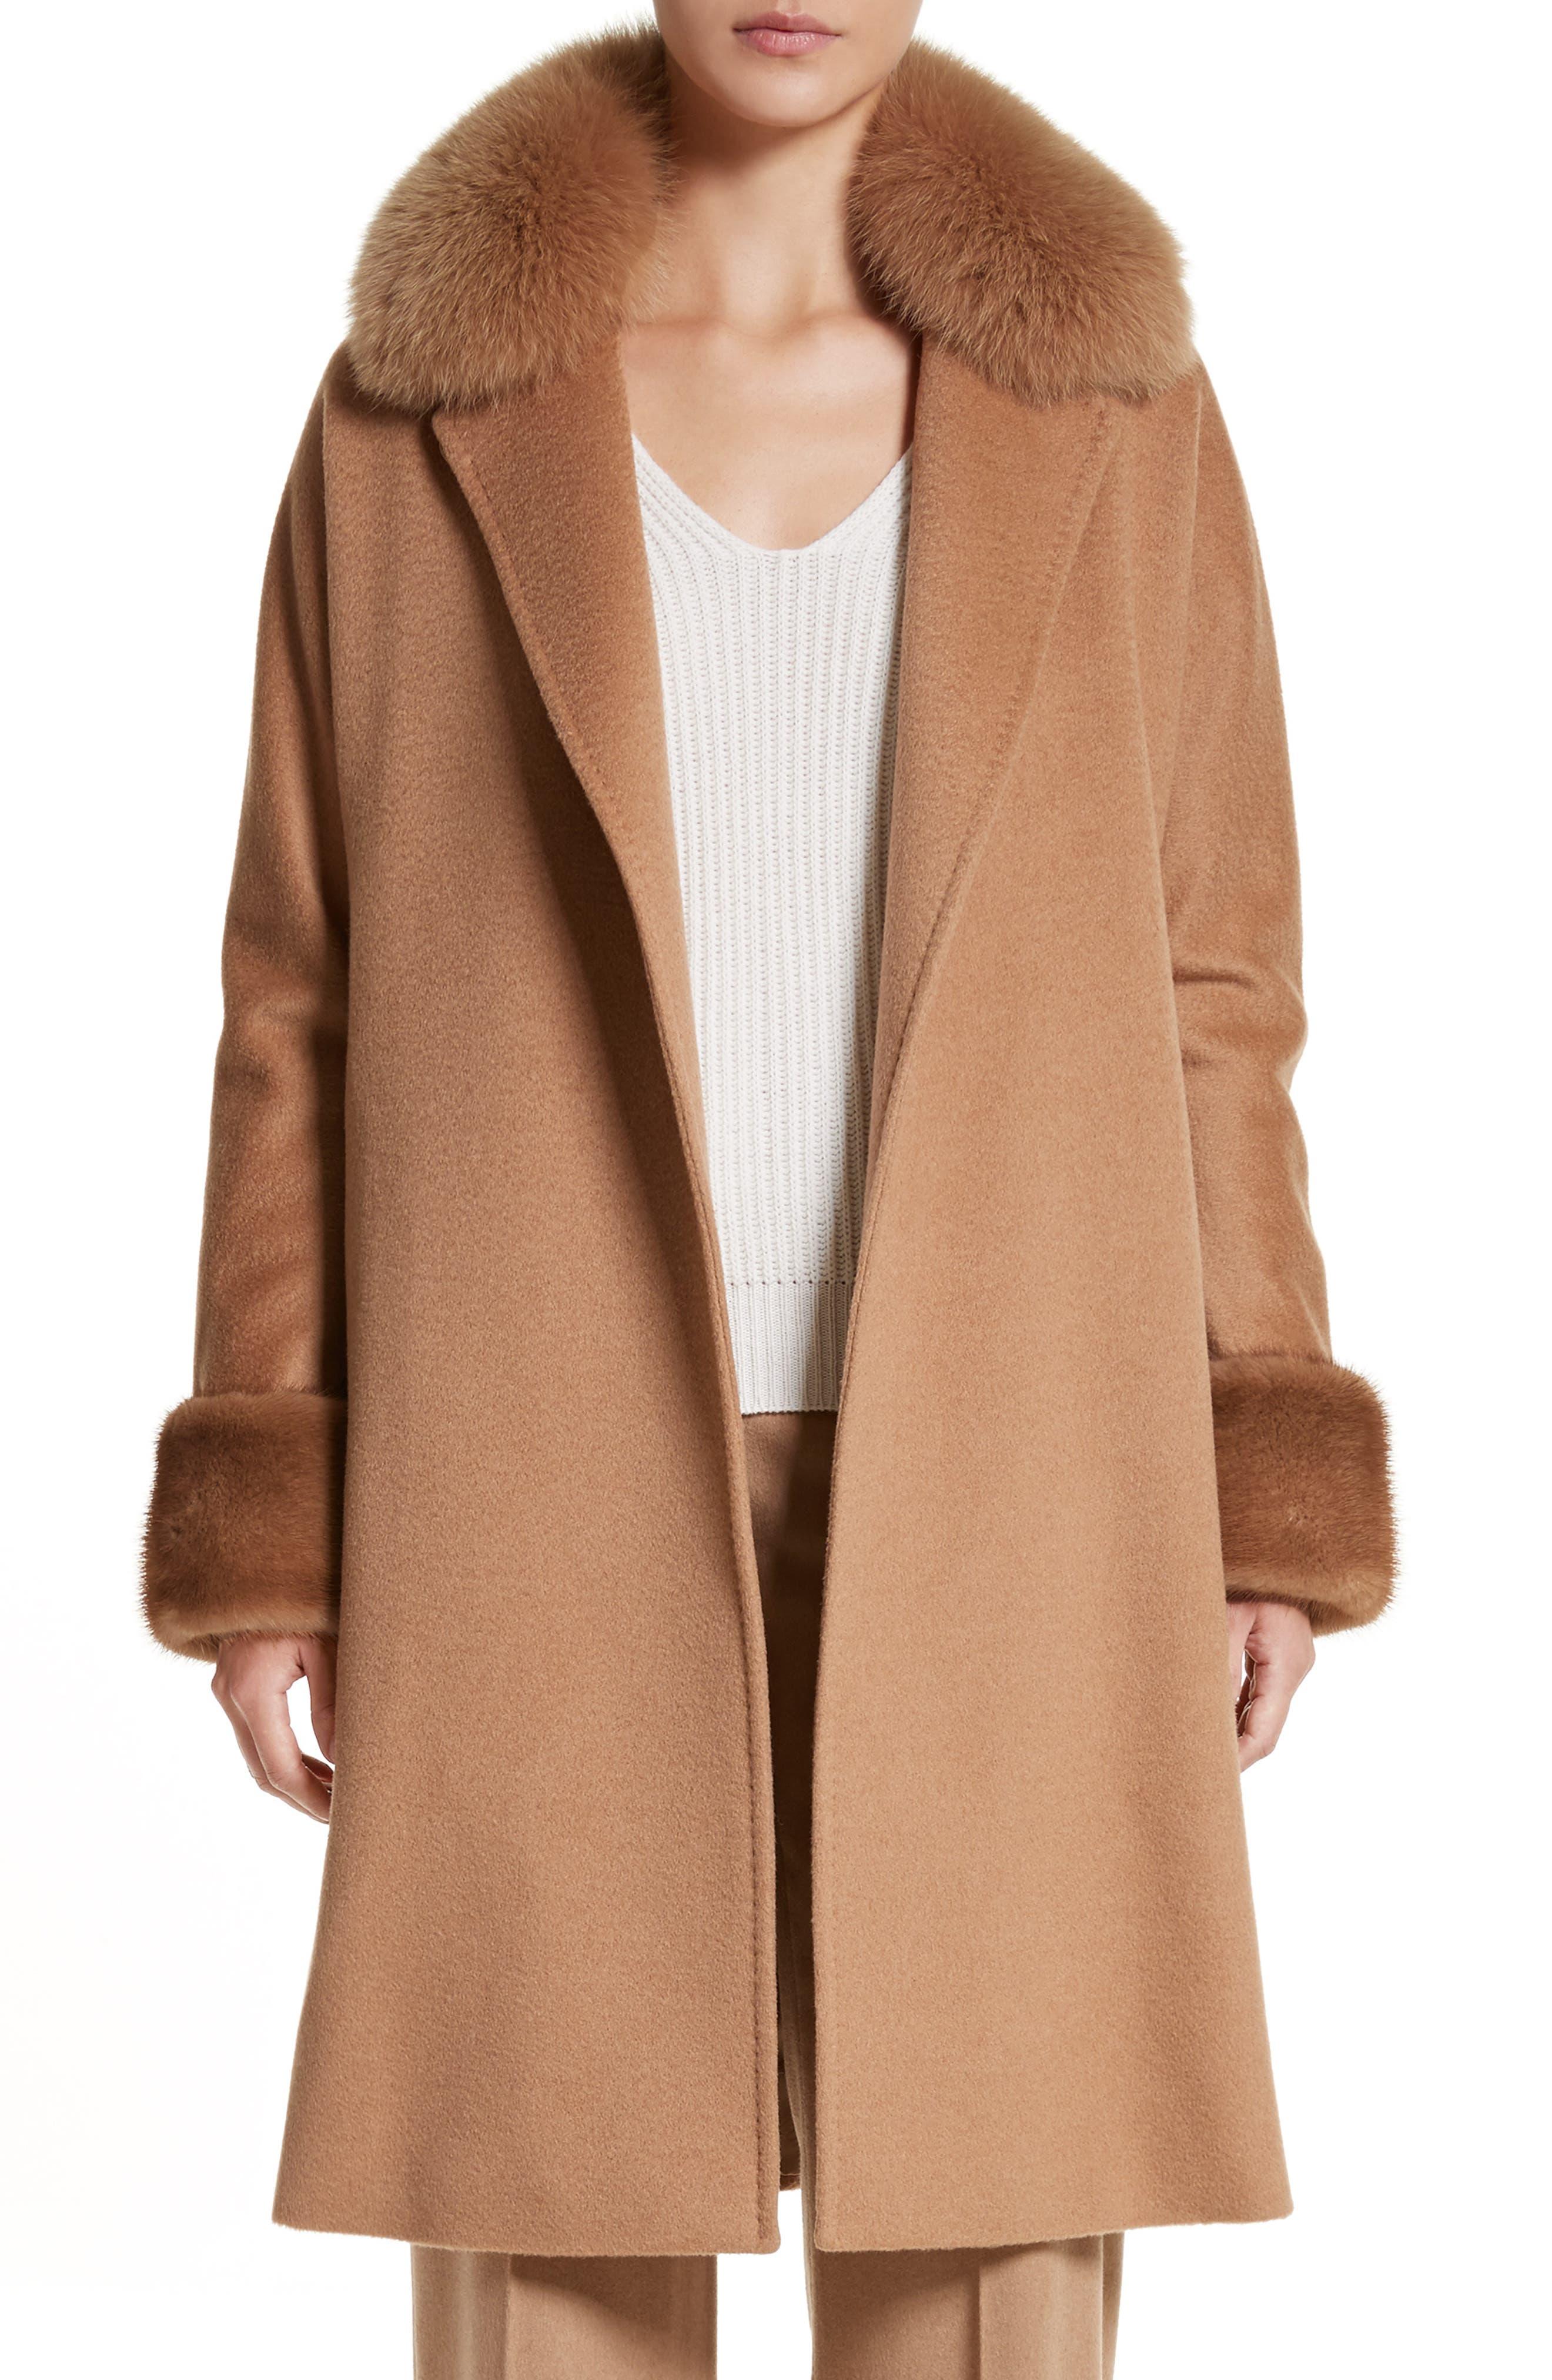 Max Mara Camel Hair Coat with Genuine Fox Fur & Genuine Mink Fur Trim